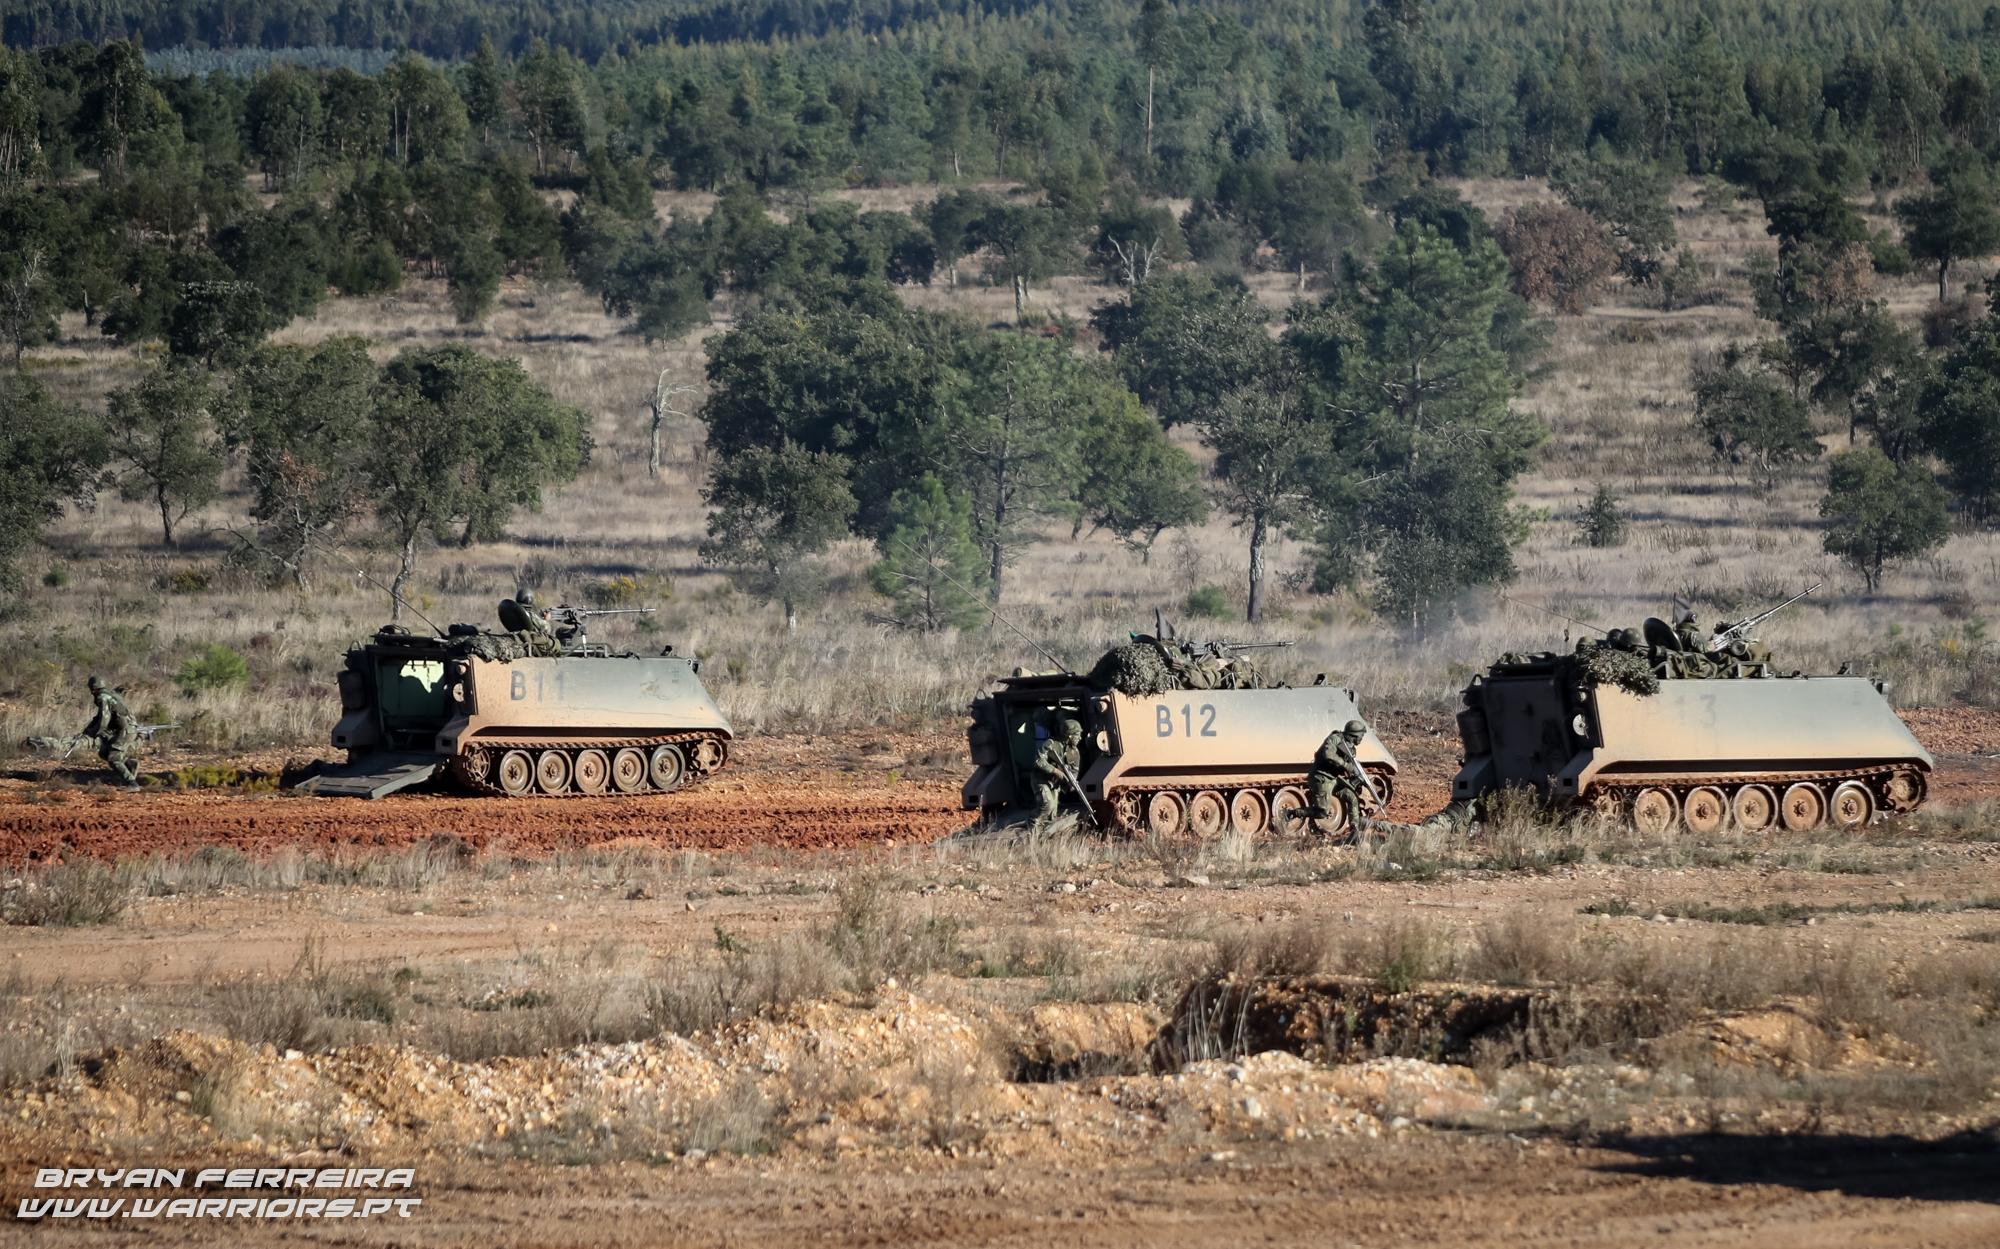 M113 dismounted Infantry